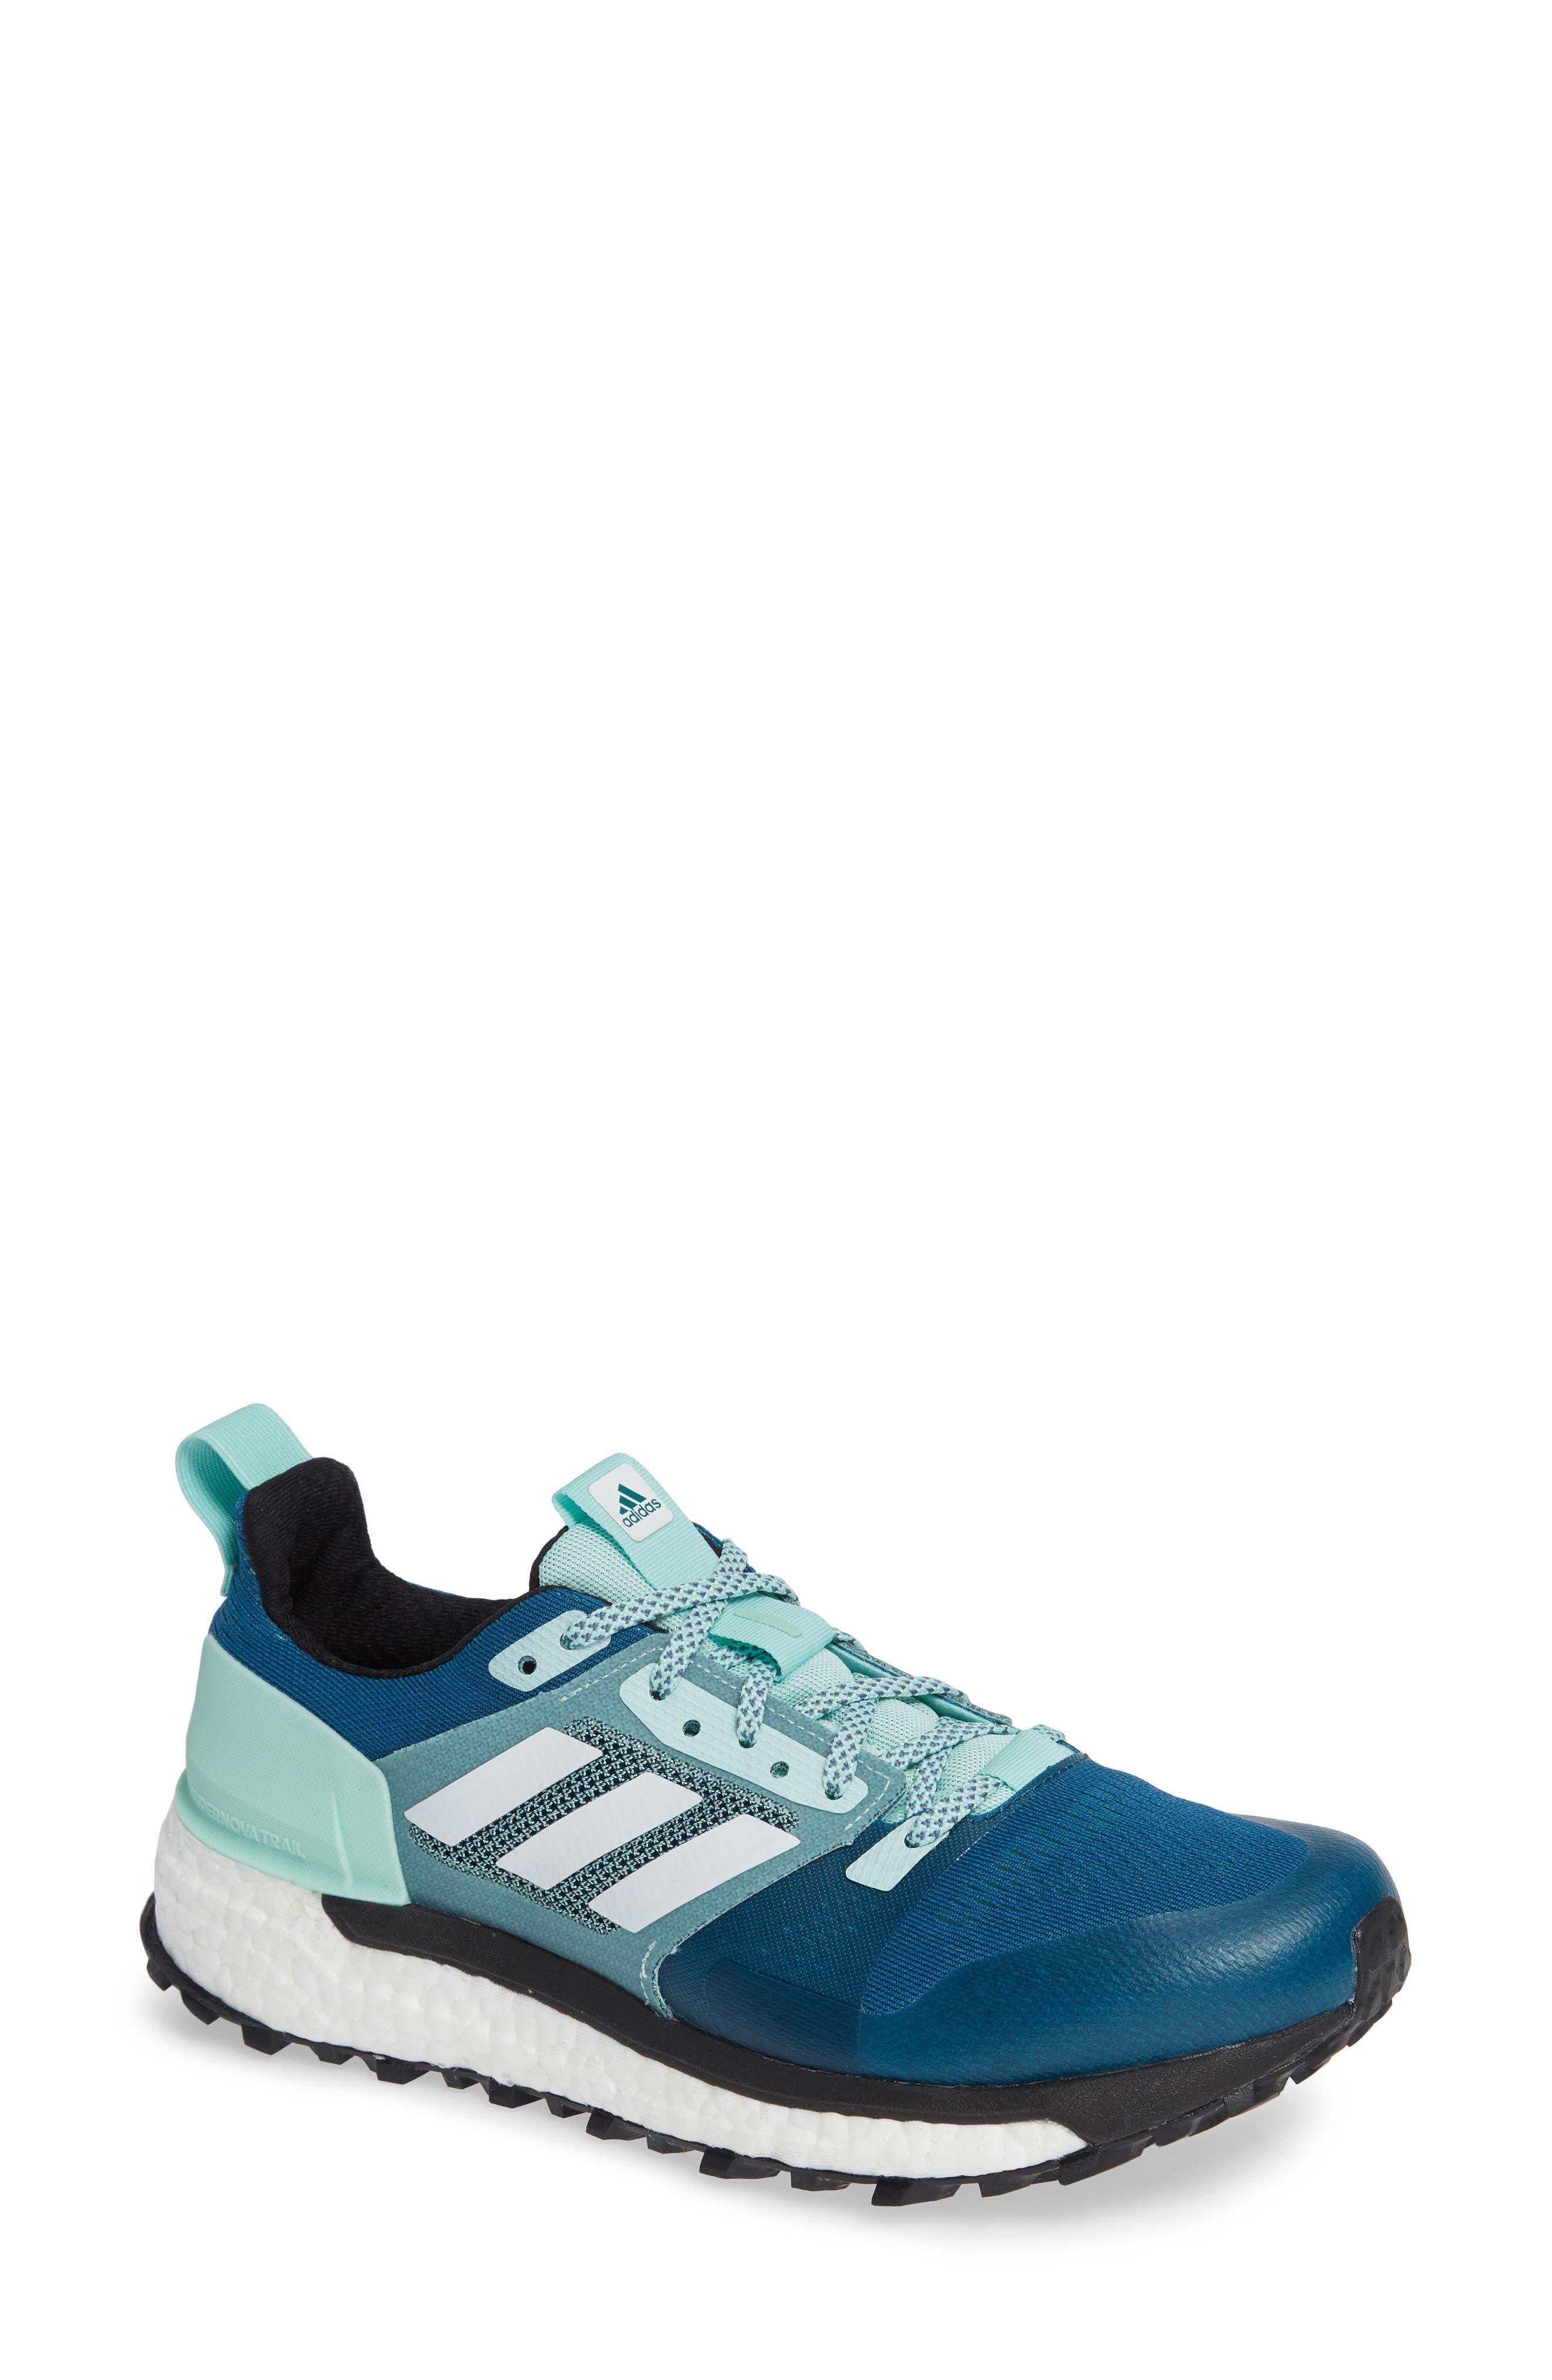 Supernova Trail Running Shoe,                             Main thumbnail 1, color,                             440